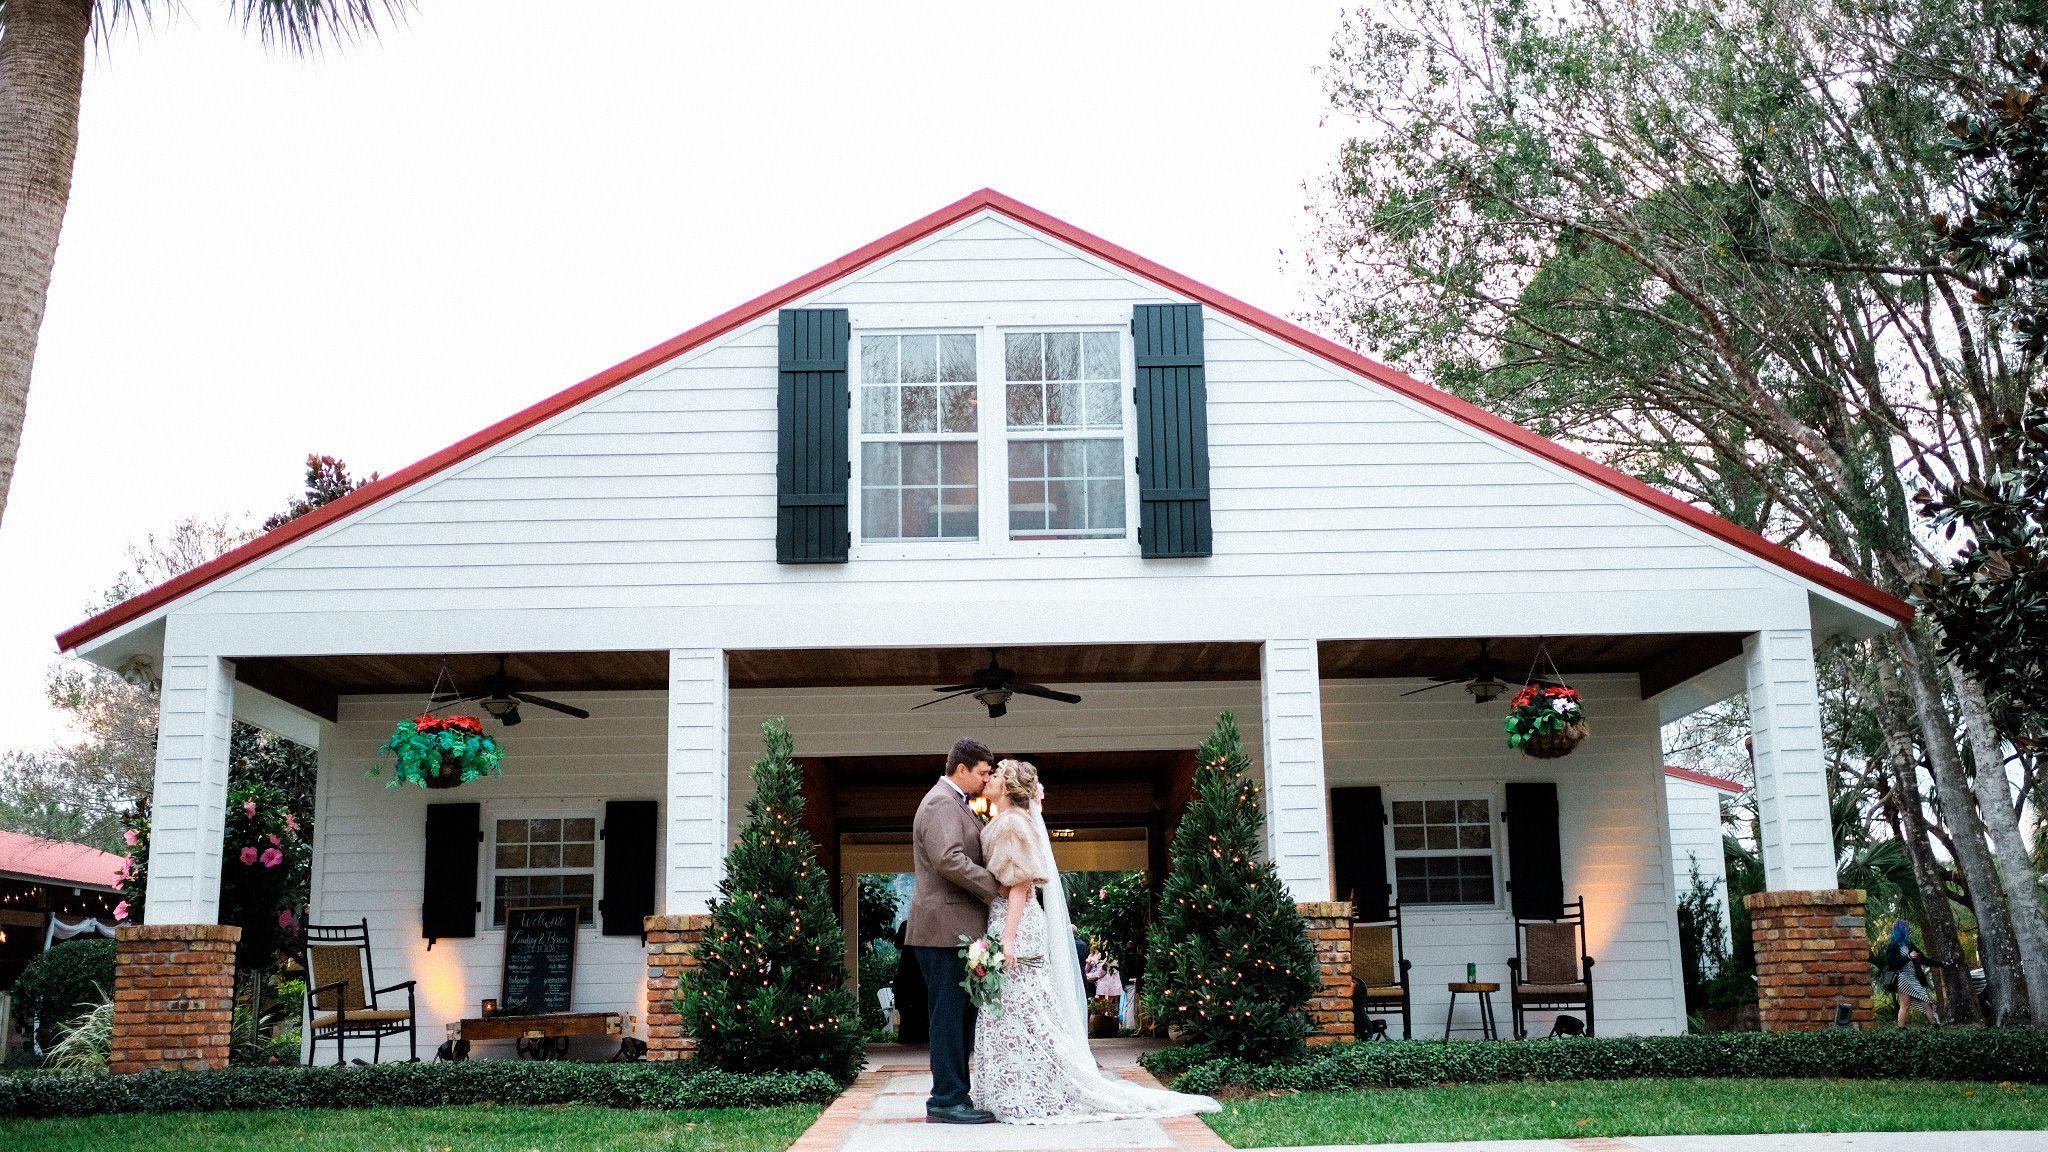 49+ Windsor manor wedding venue augusta ga ideas in 2021